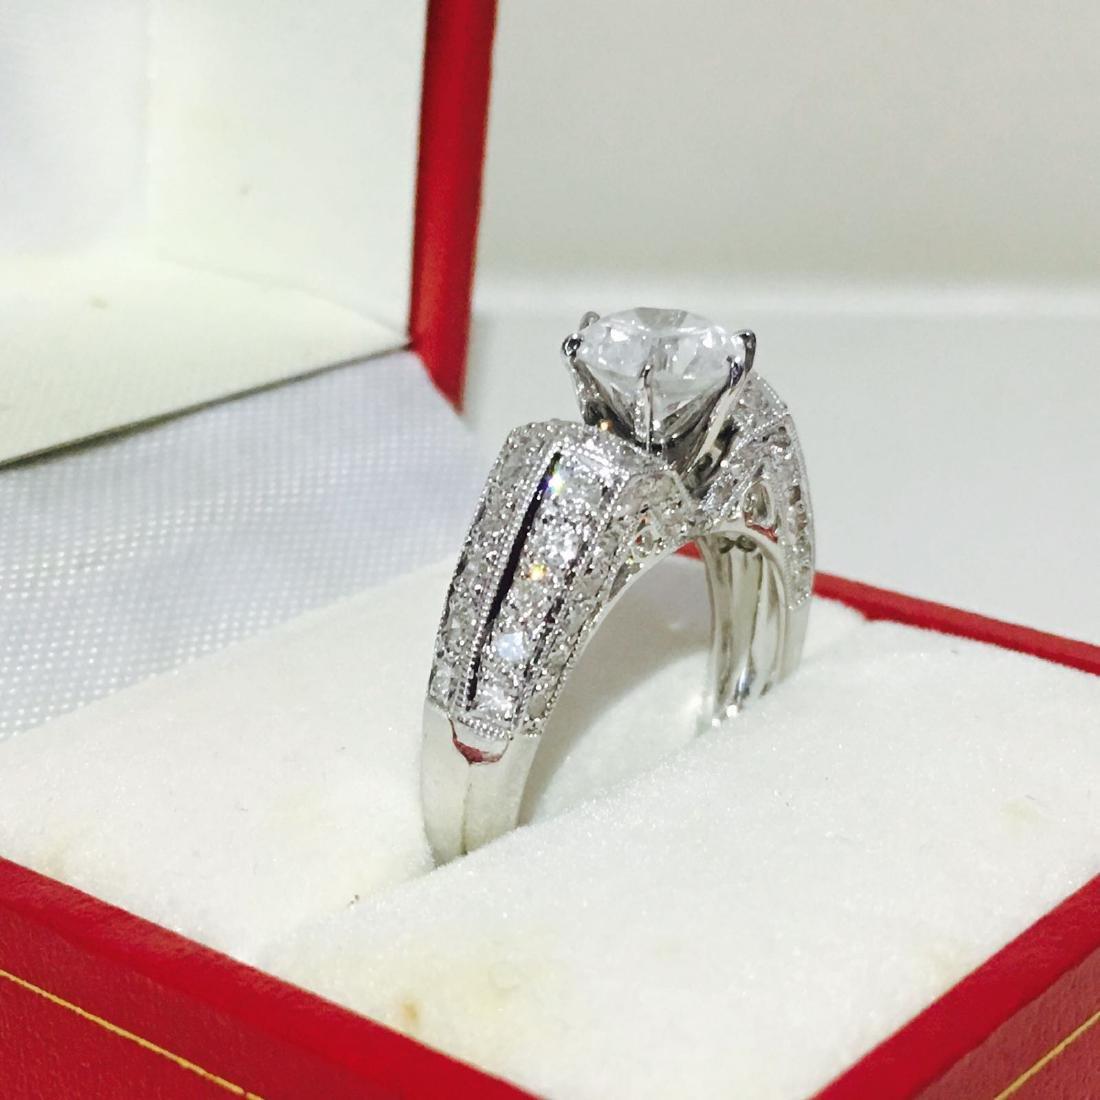 18K White Gold, 2.10 CT Diamond Engagement Ring - 4